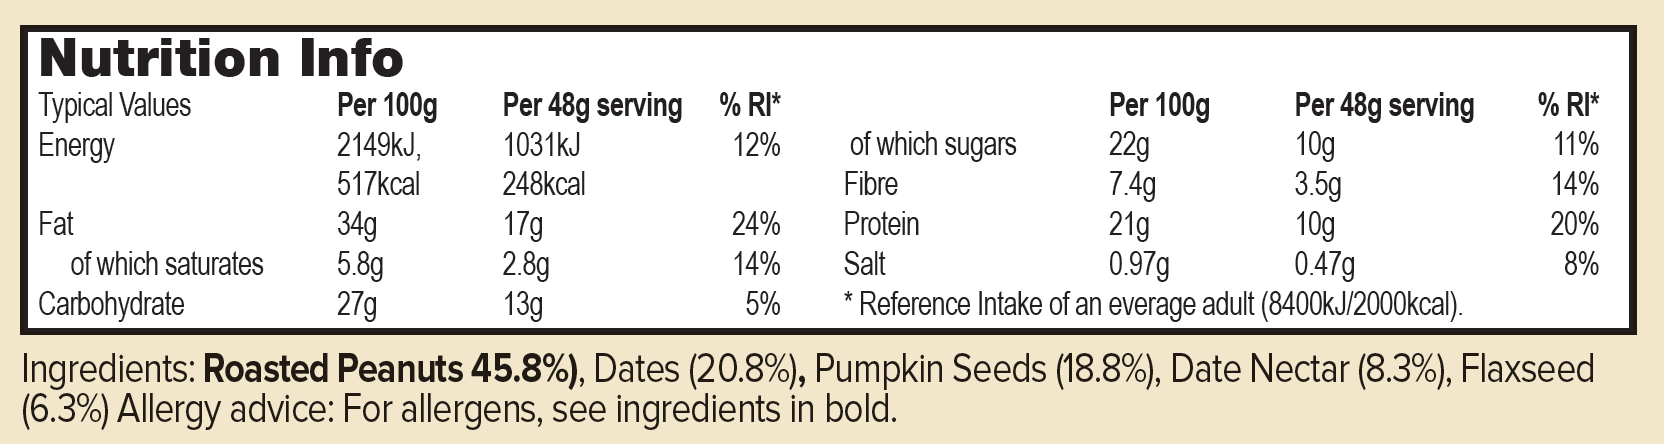 Peanut Nutrition